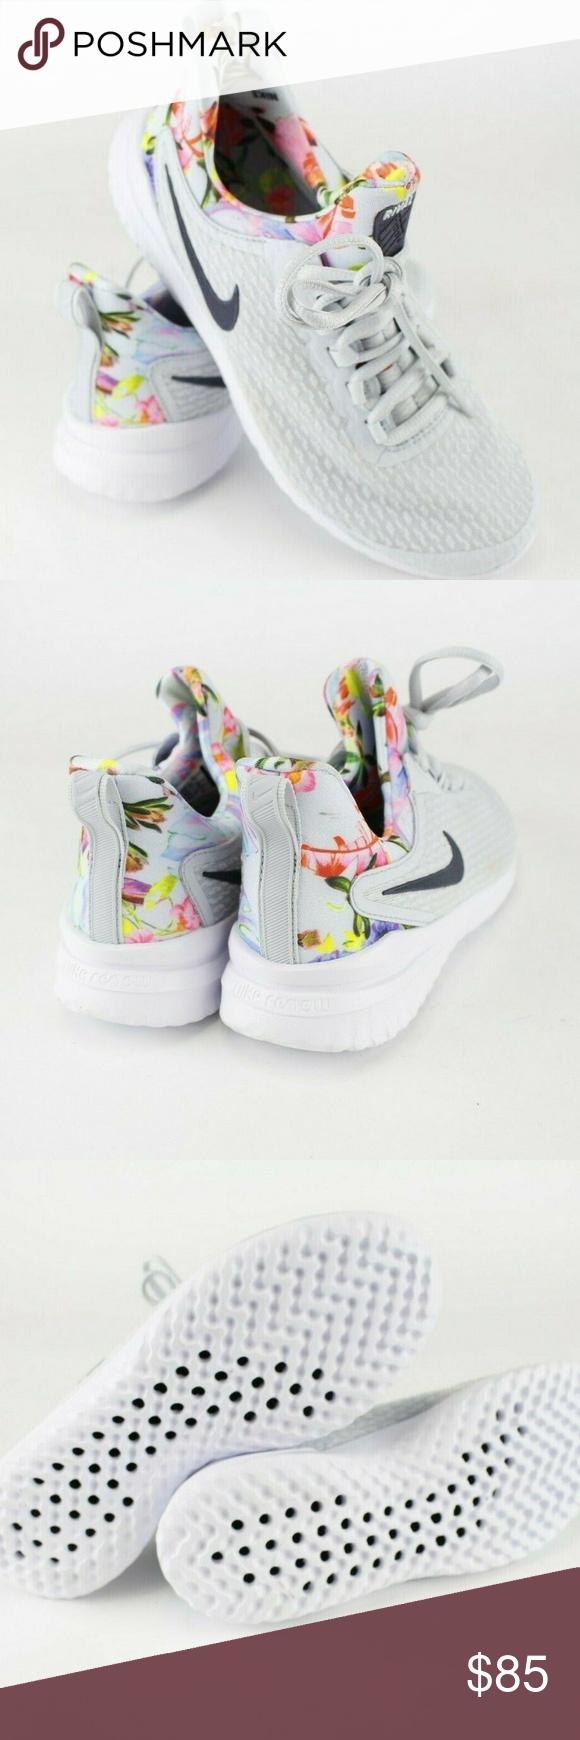 Nike Wmns Renew Rival Premium Floral Print Womens Running Shoes AV2606-001